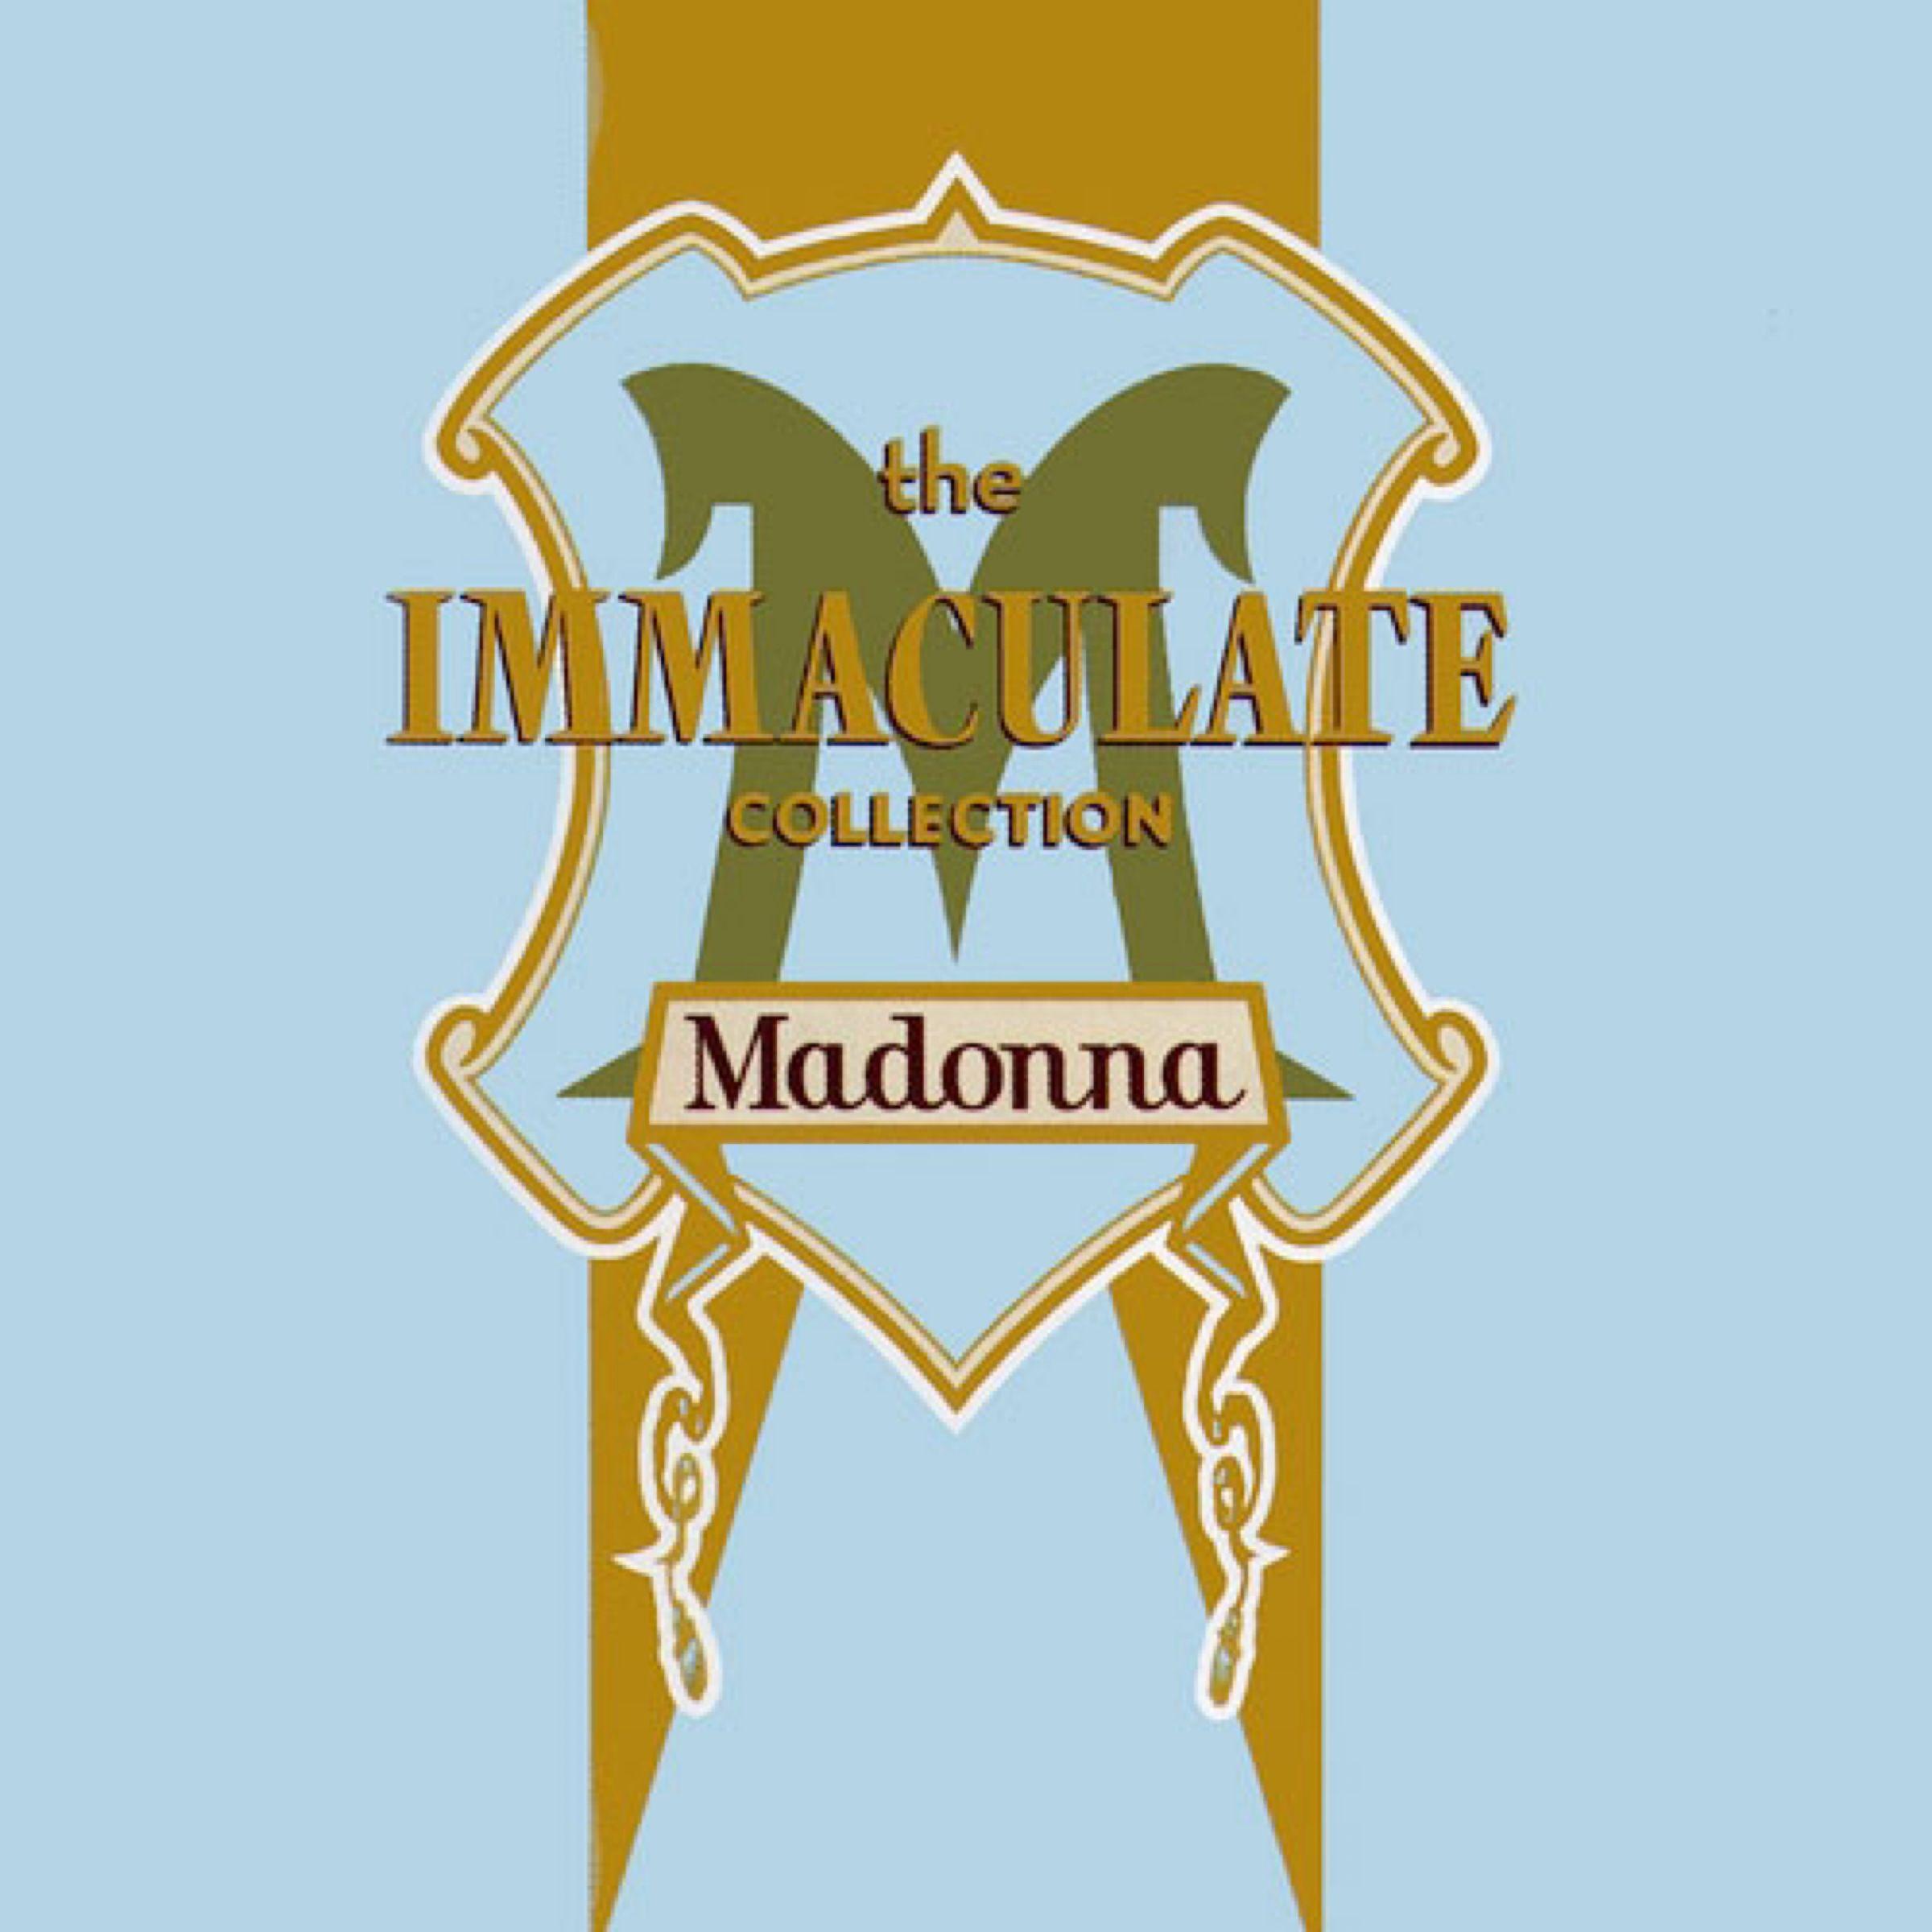 Theimmaculatecollection Madonna Music Madonna The Immaculate Collection The Immaculate Collection Madonna